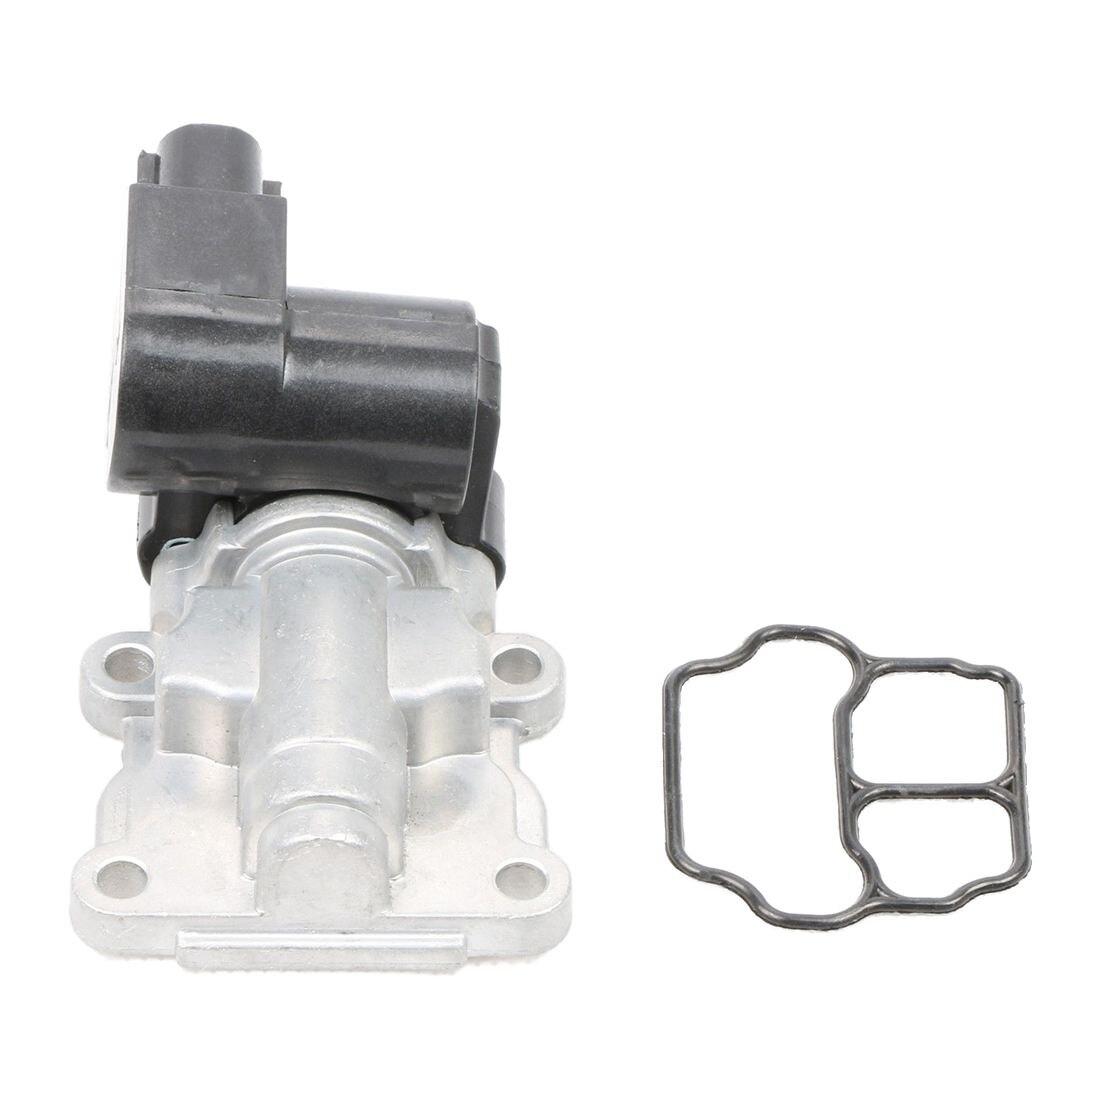 New Idle Air Control Valve / Motor IAC 98 - 01 Fits Prizm / Corolla 1.8L L4  car styling good quality idle air control valve motor for toyota corolla 22270 16090 2227016090